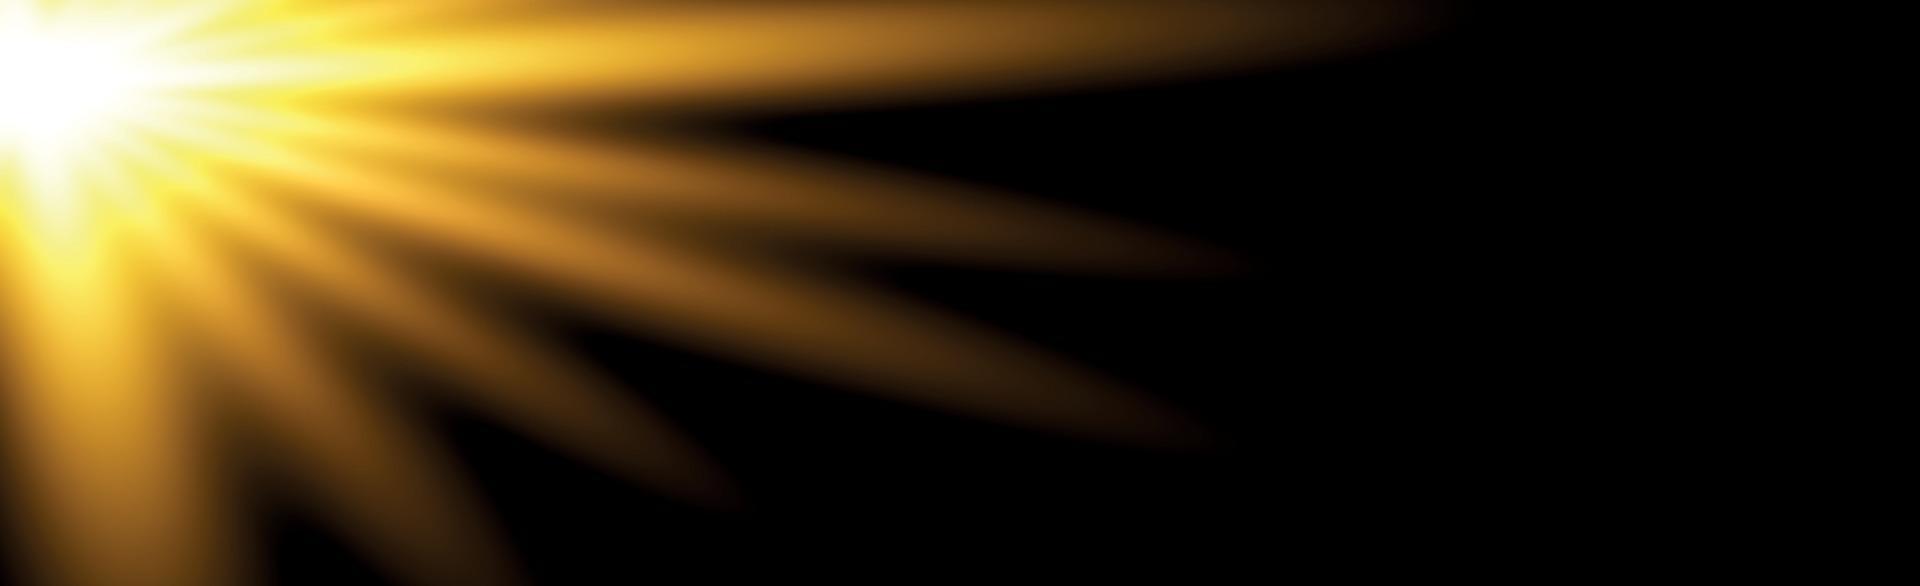 Bright sun on a black background - Illustration vector